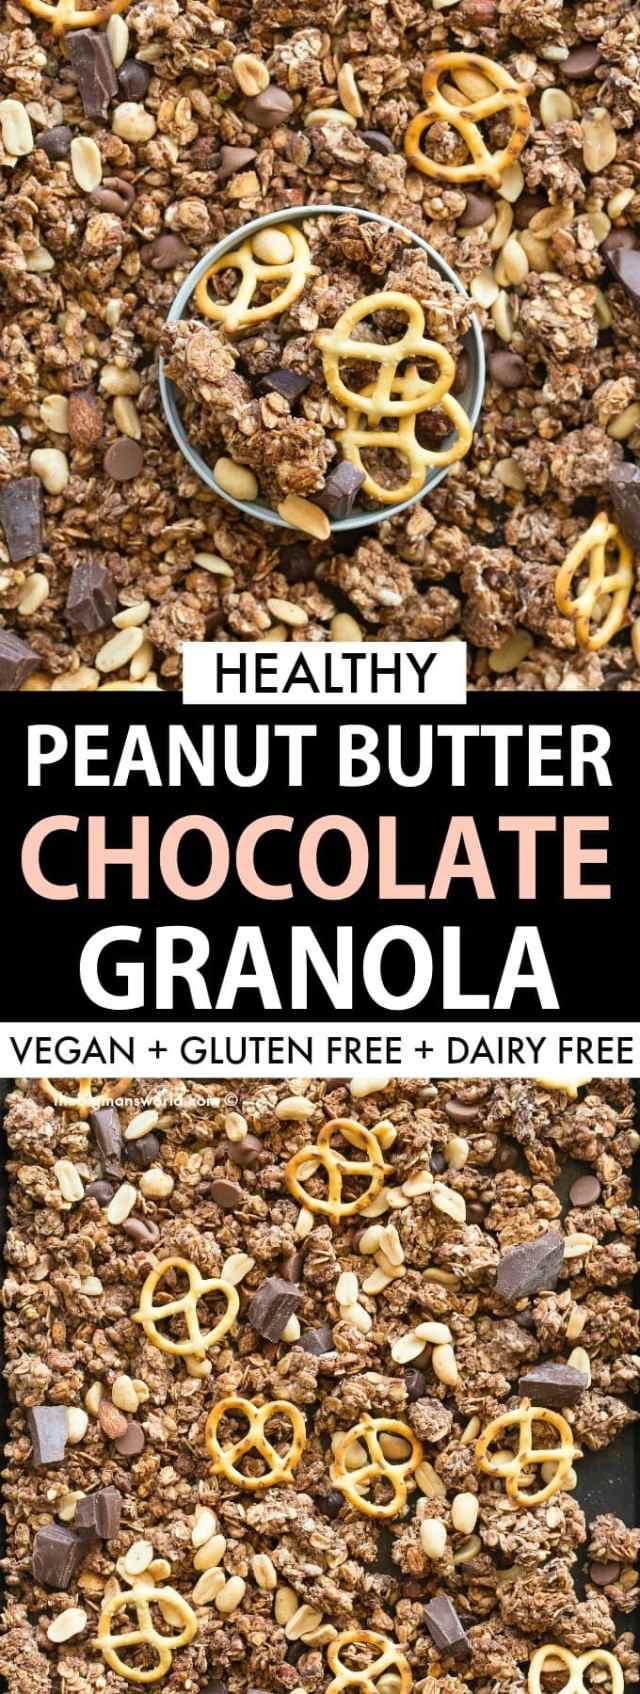 Easy homemade vegan chocolate peanut butter granola recipe